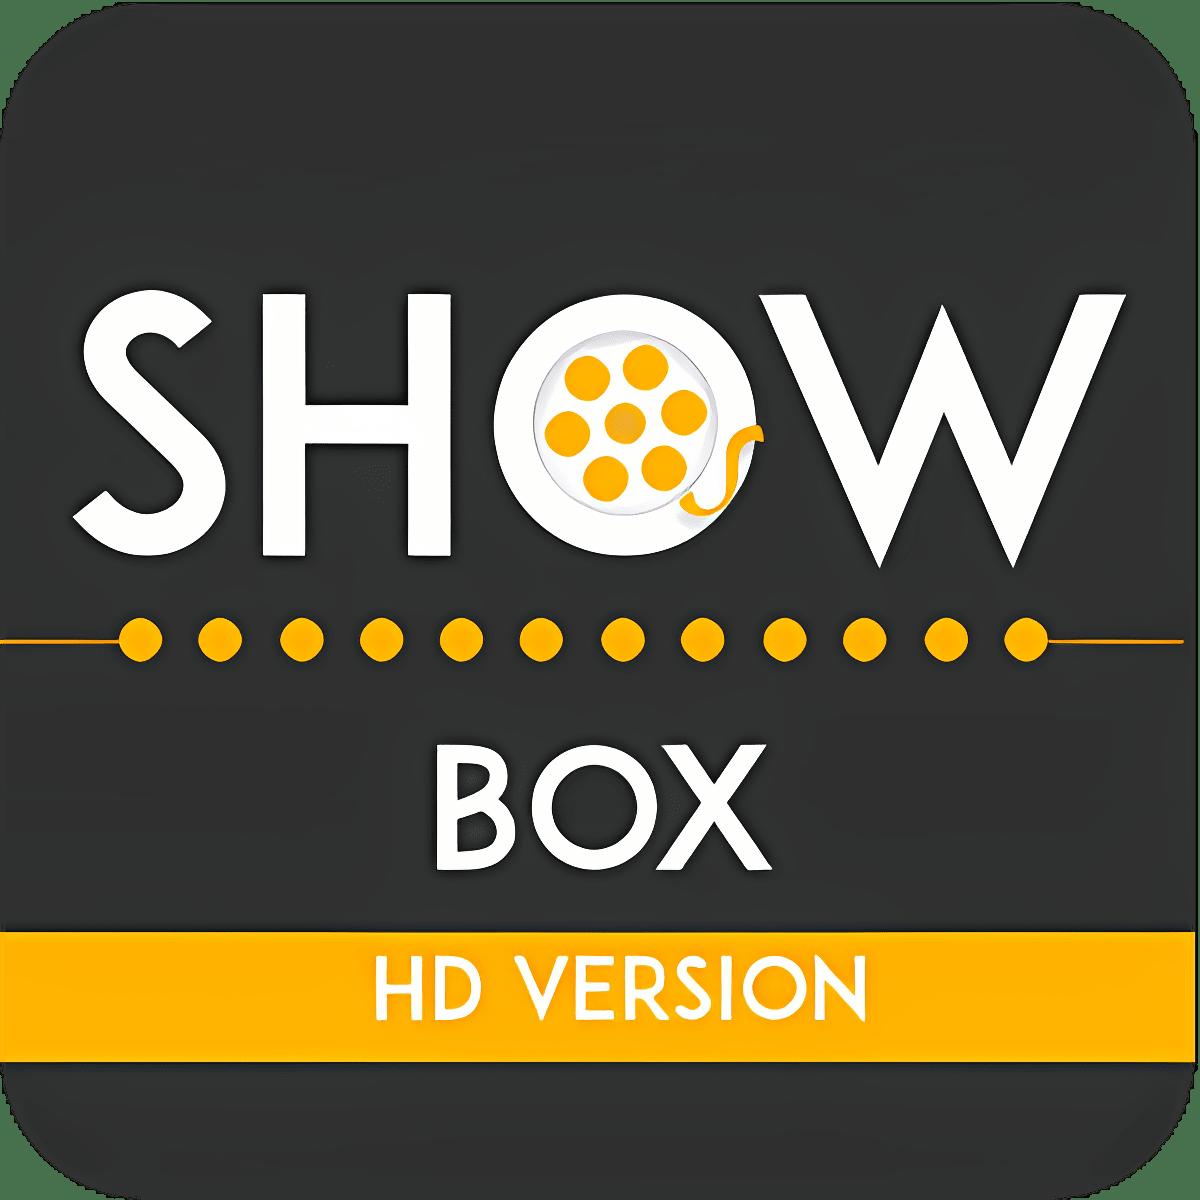 Show Movies HD Box - 2017 4.0